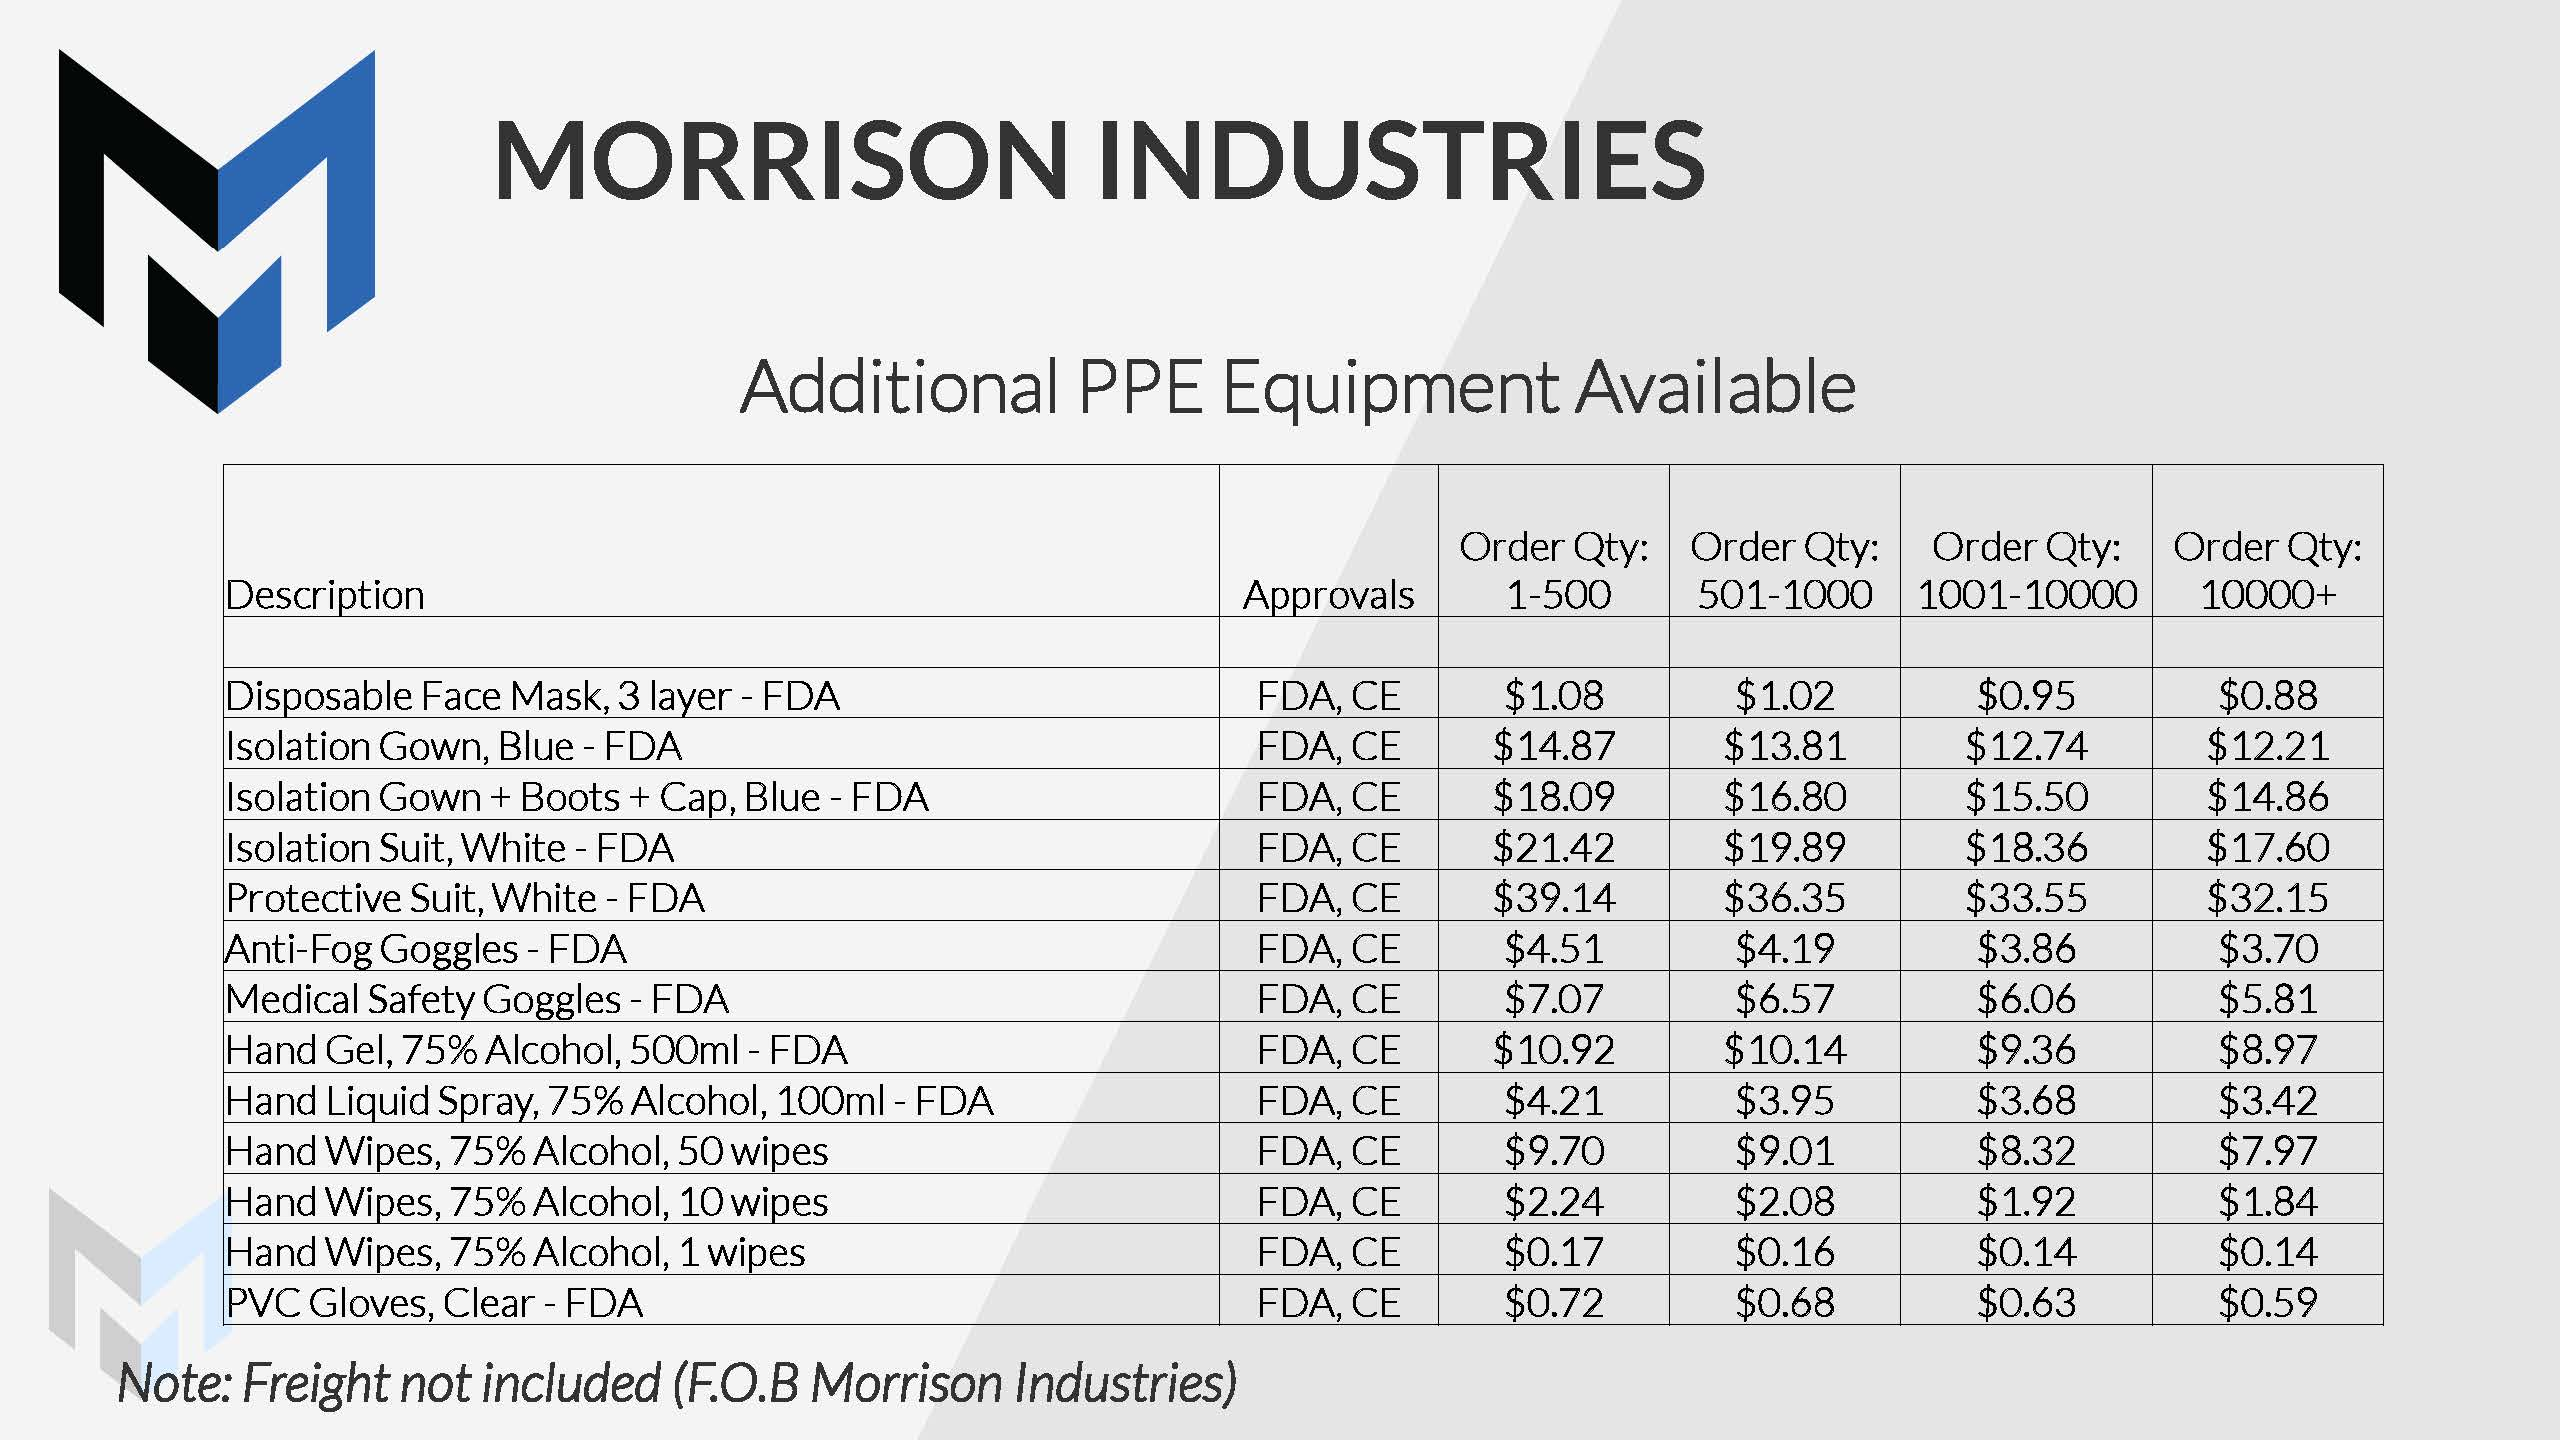 Morrison Industries PPE